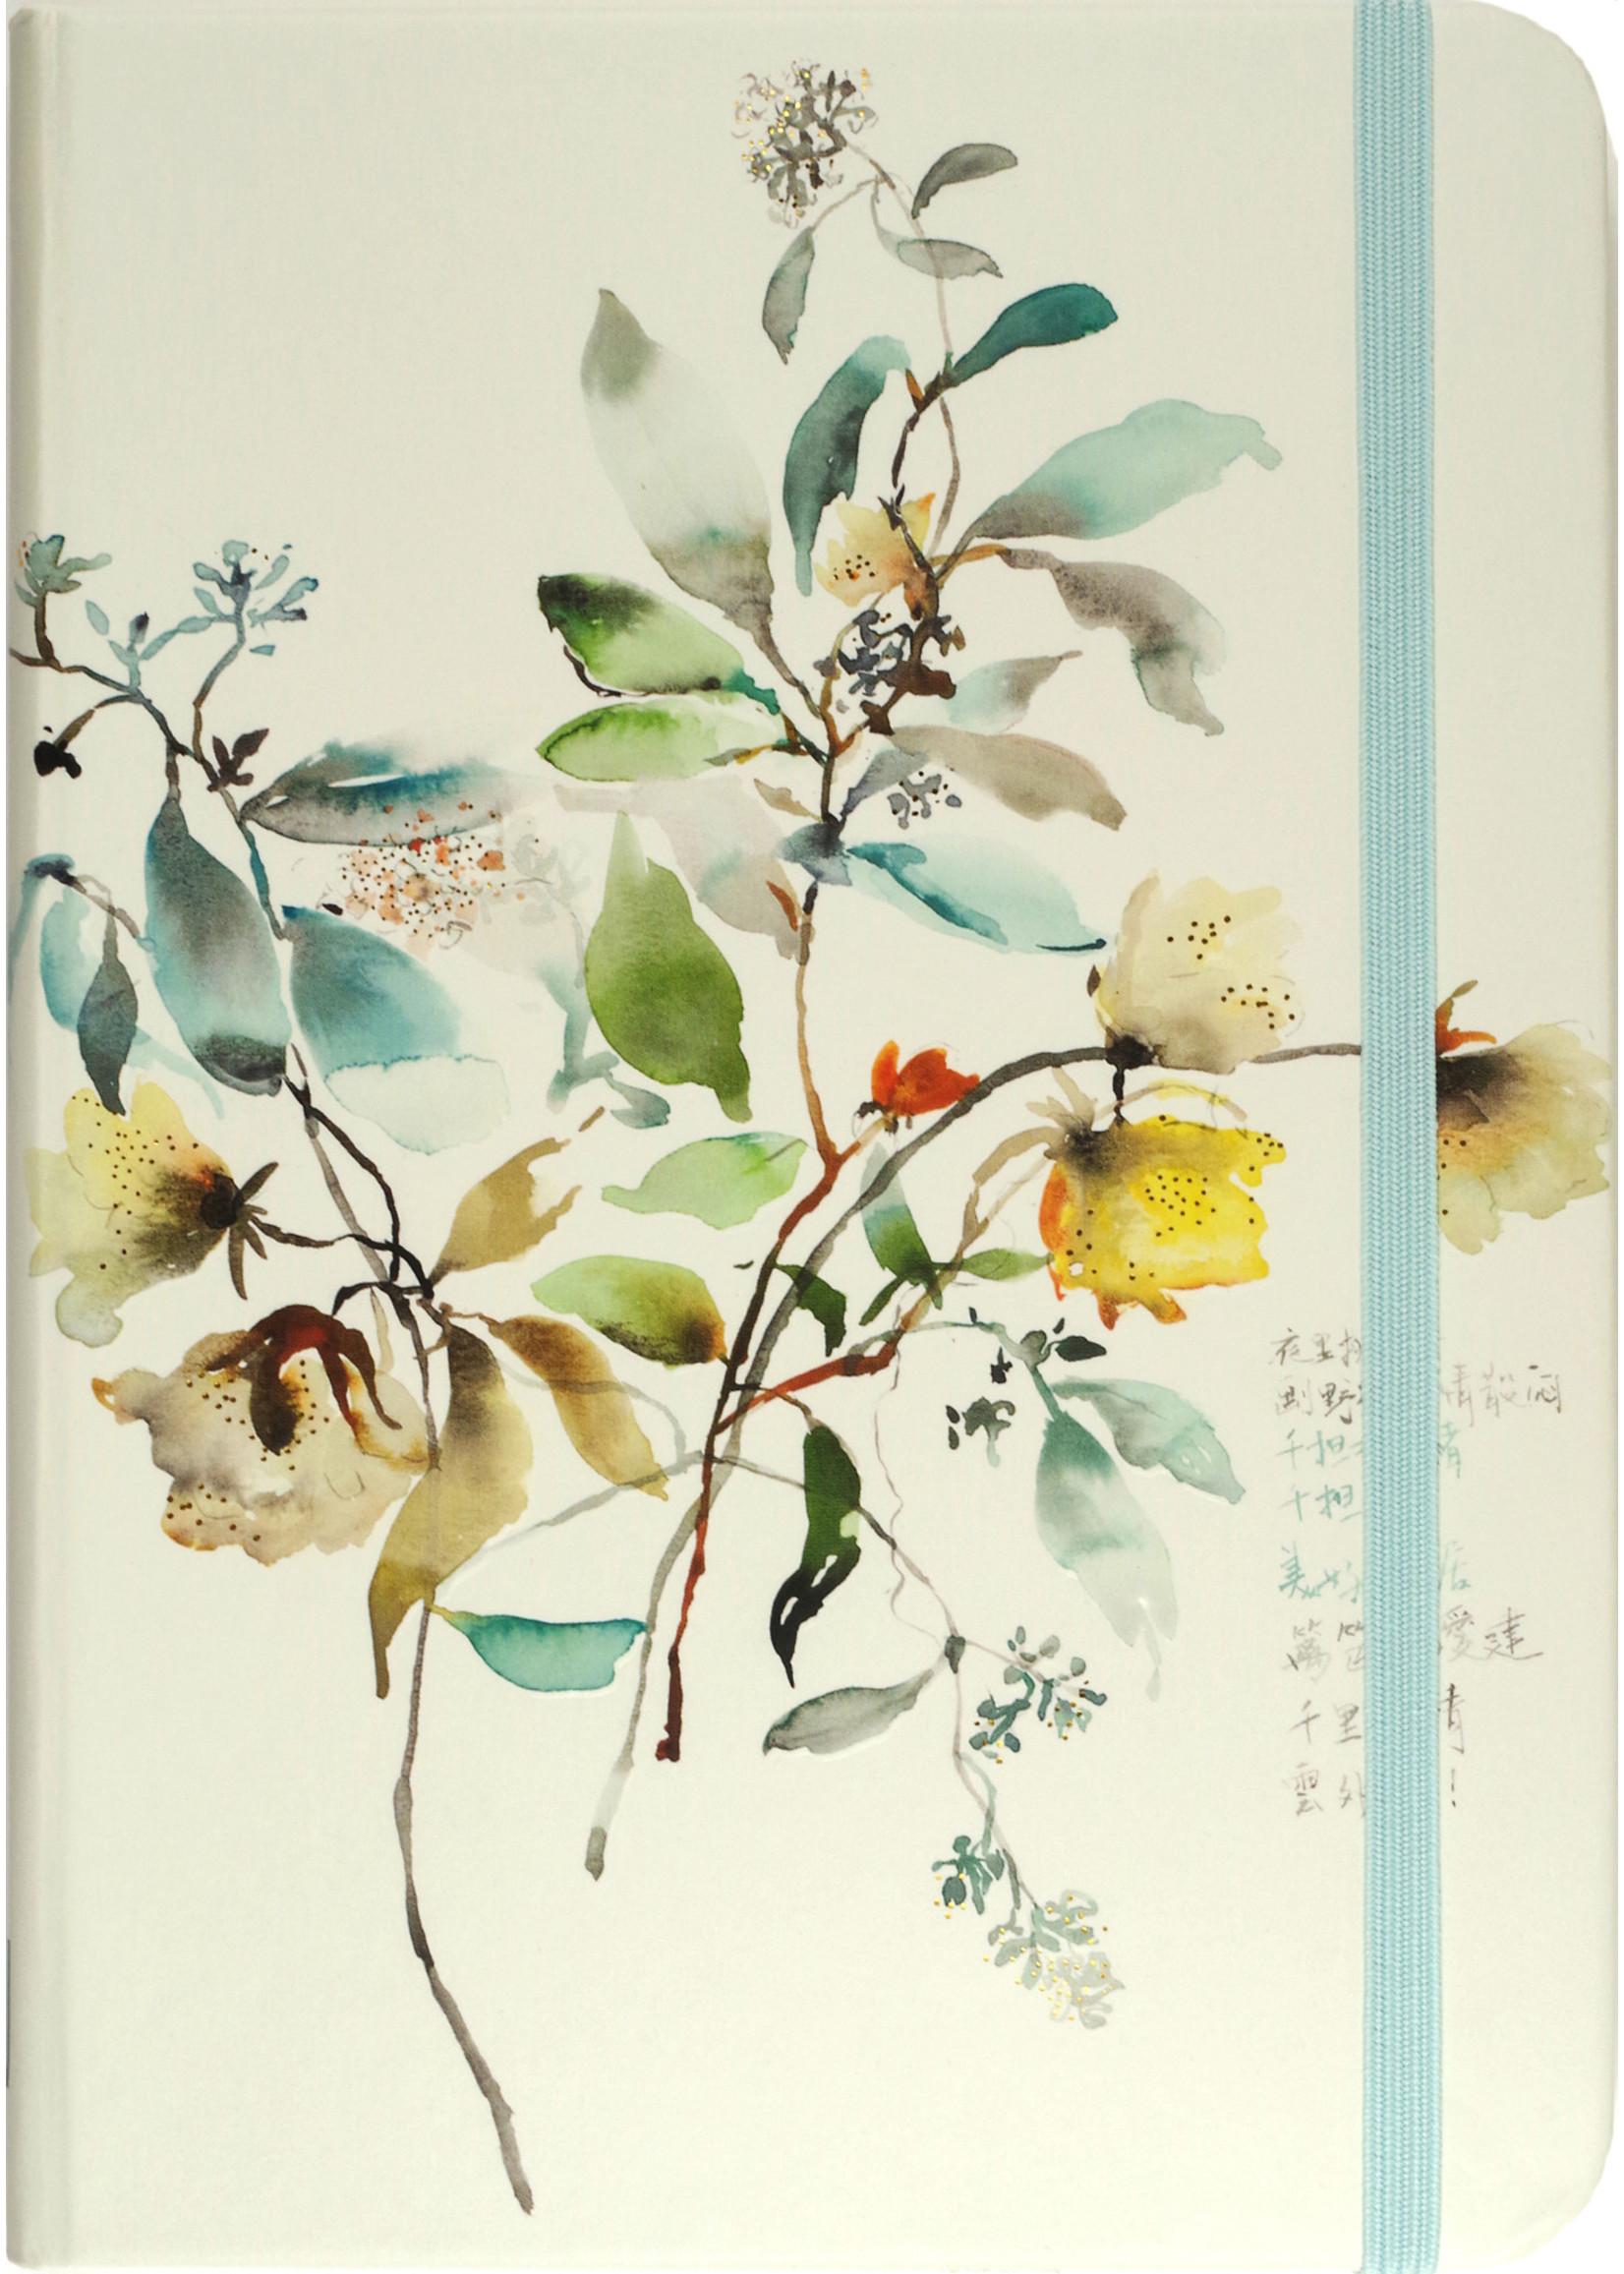 Peter Pauper Press Asian Botanical Small Journal